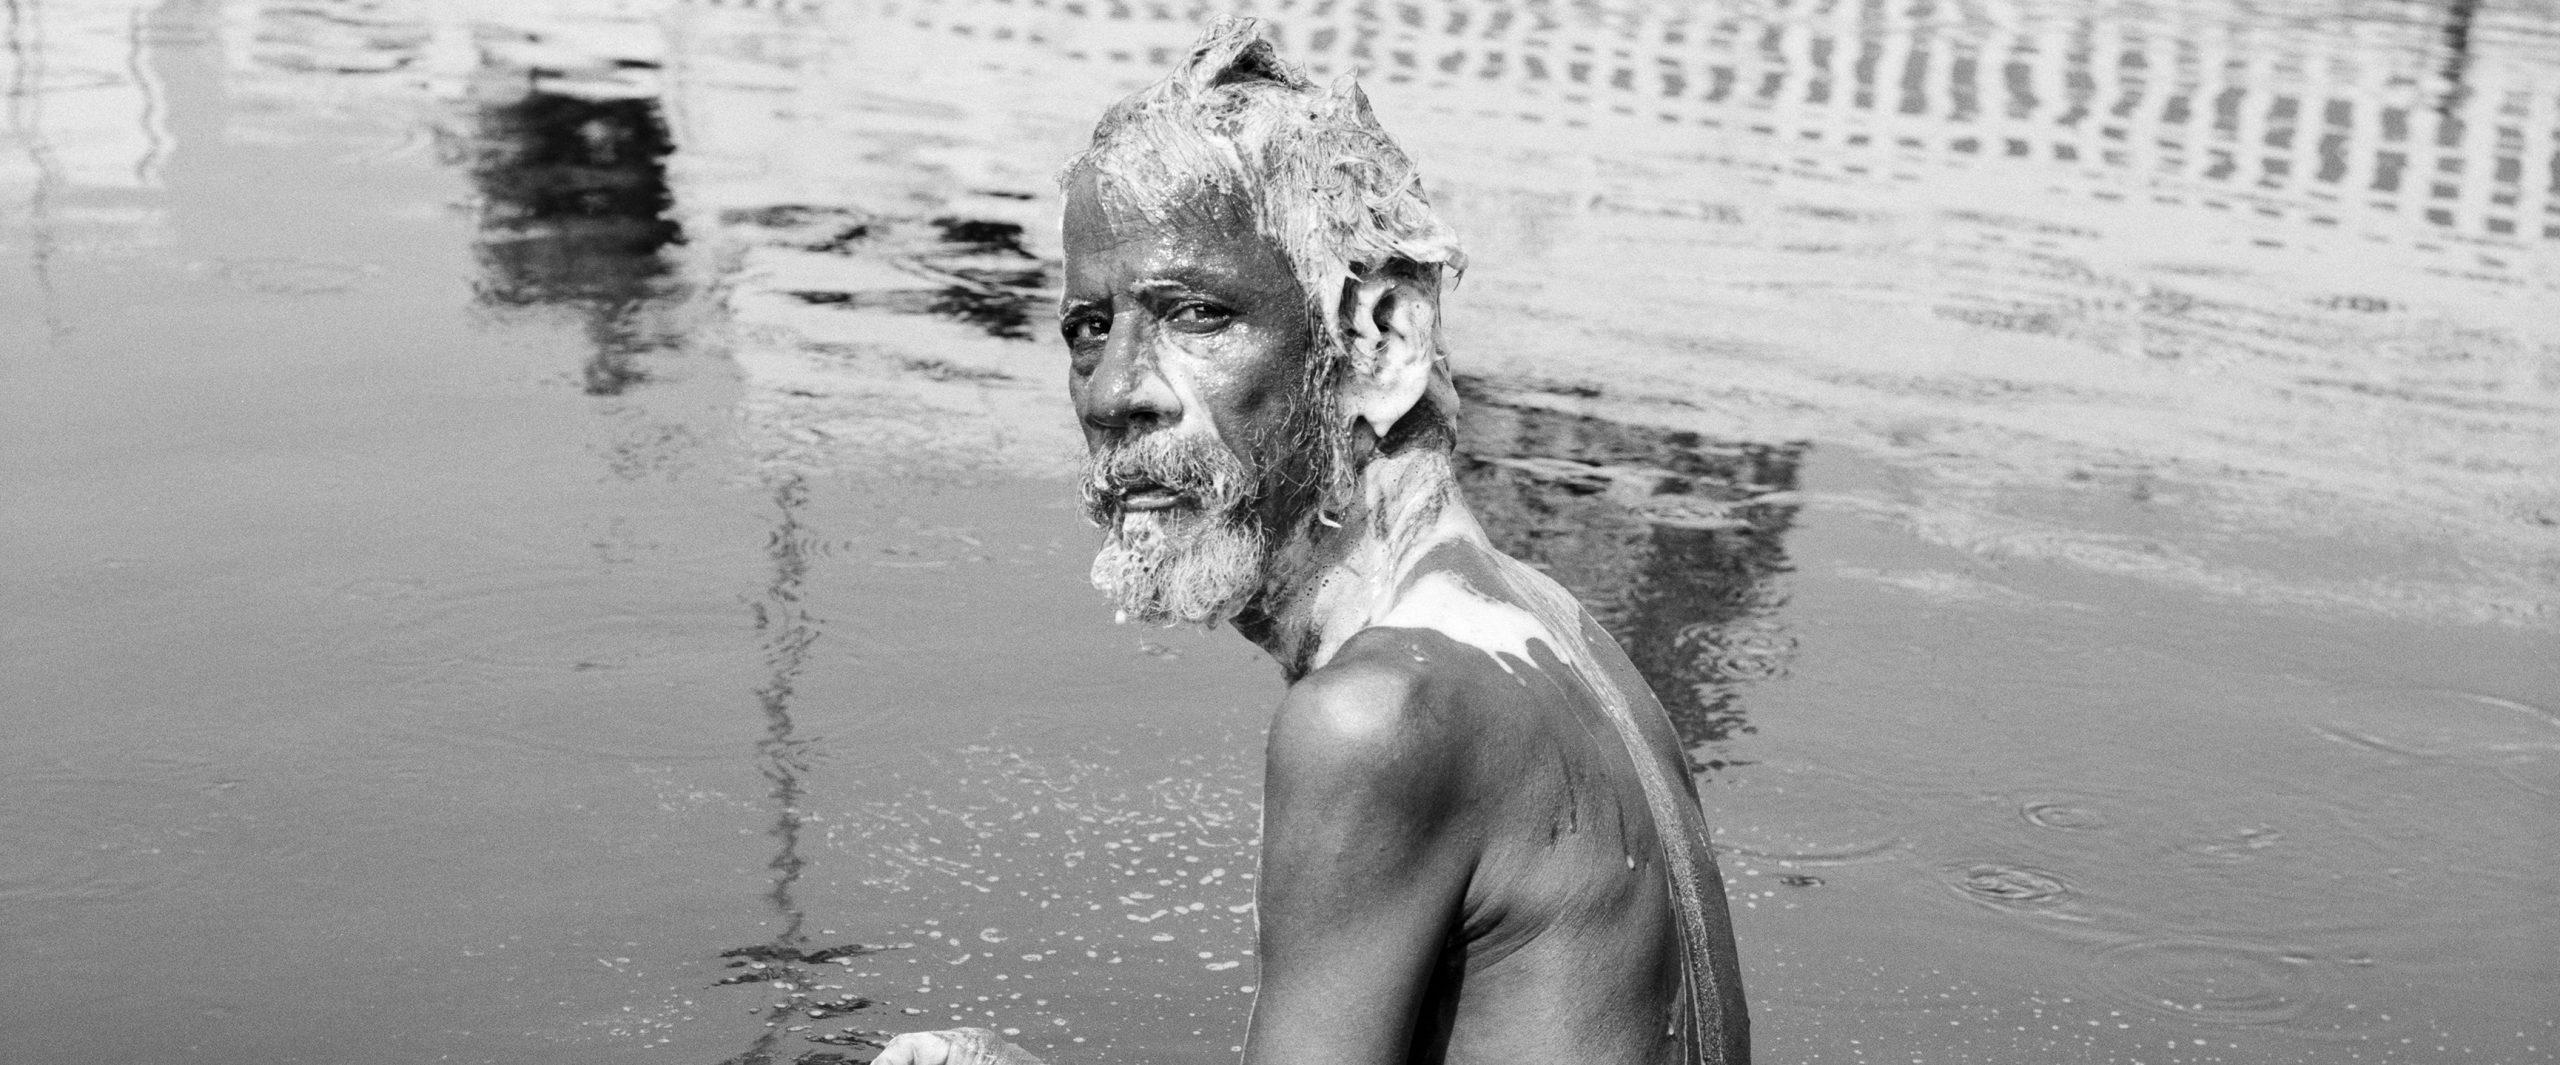 Chennai, Holy bath, Inde, 2014